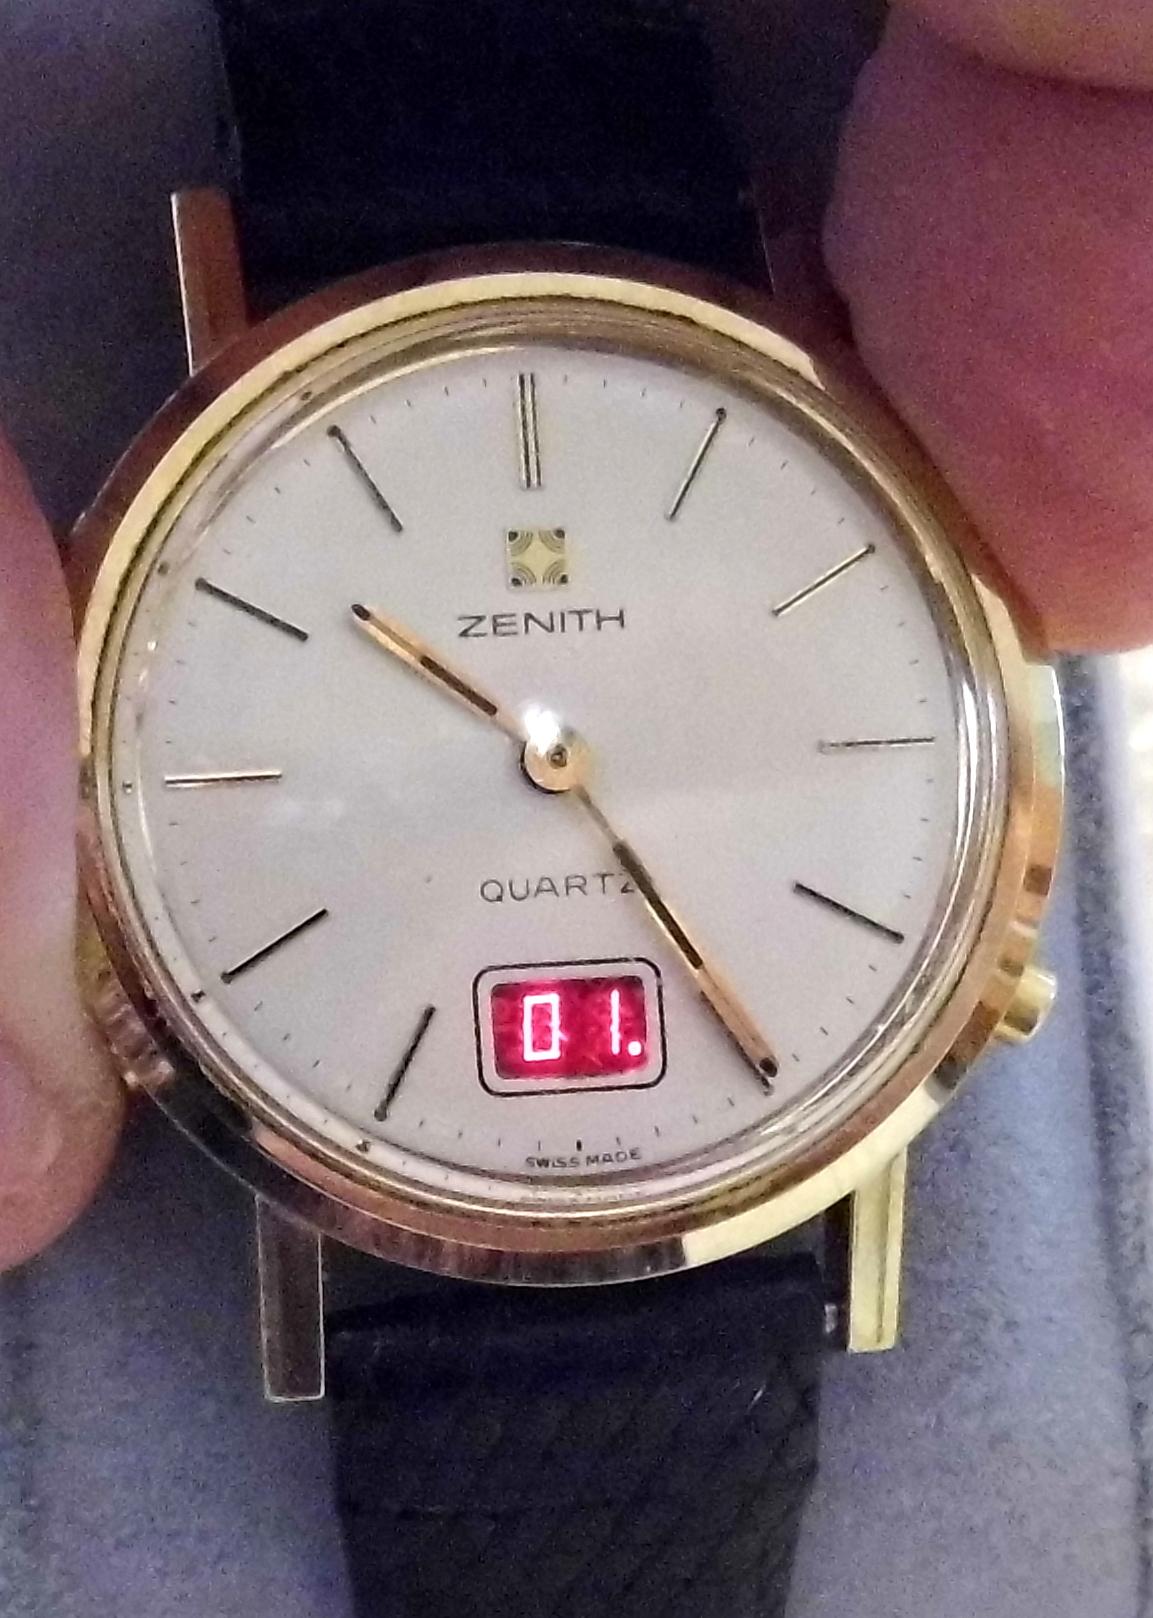 zenith watch history